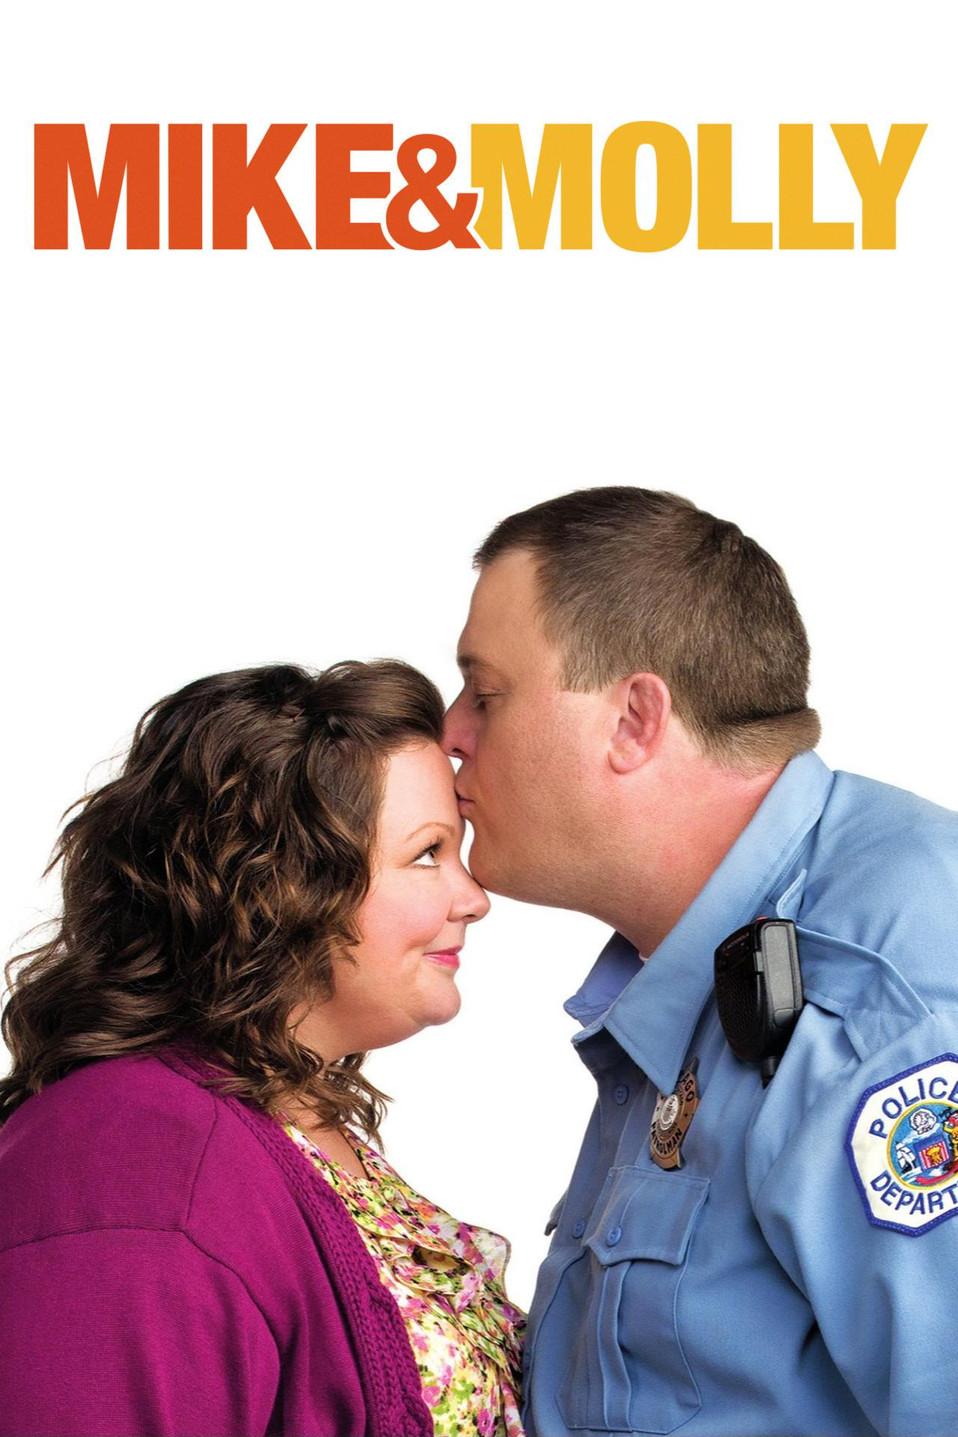 Mike & Molly 2.jpg